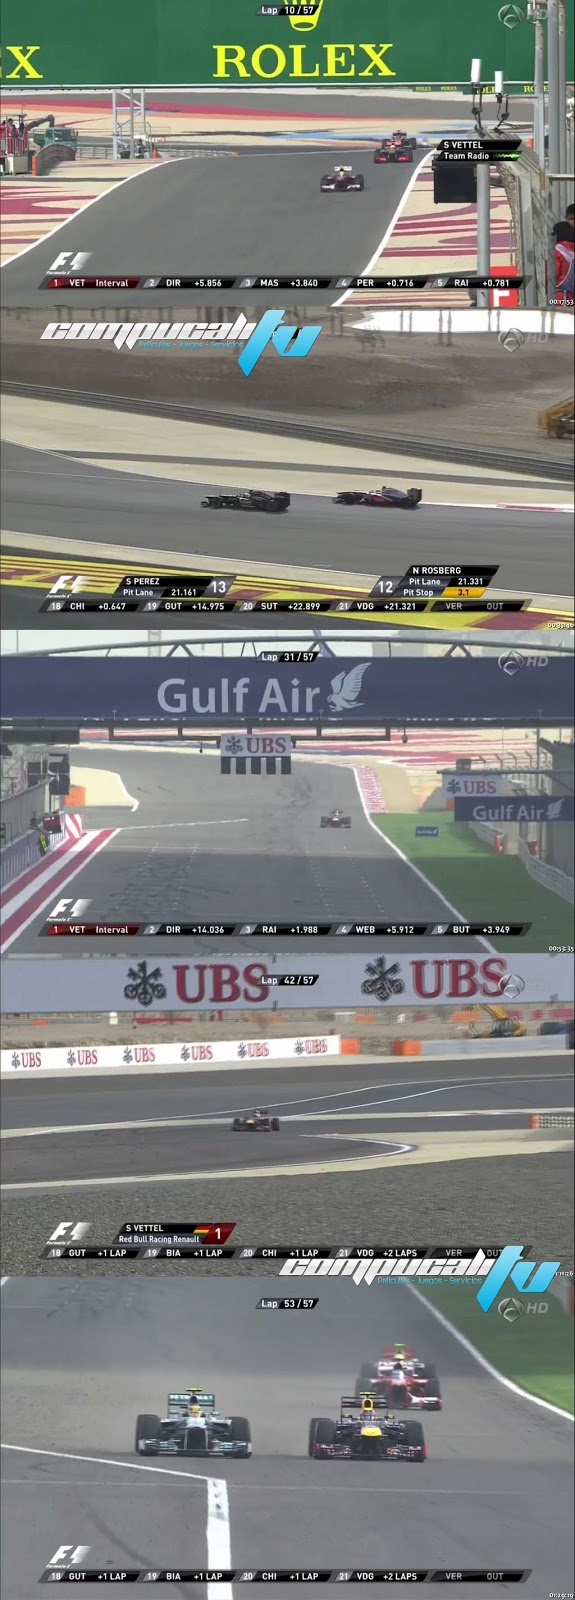 Carrera GP Bahrein Formula 1 Abril 21 HD 2013 Español